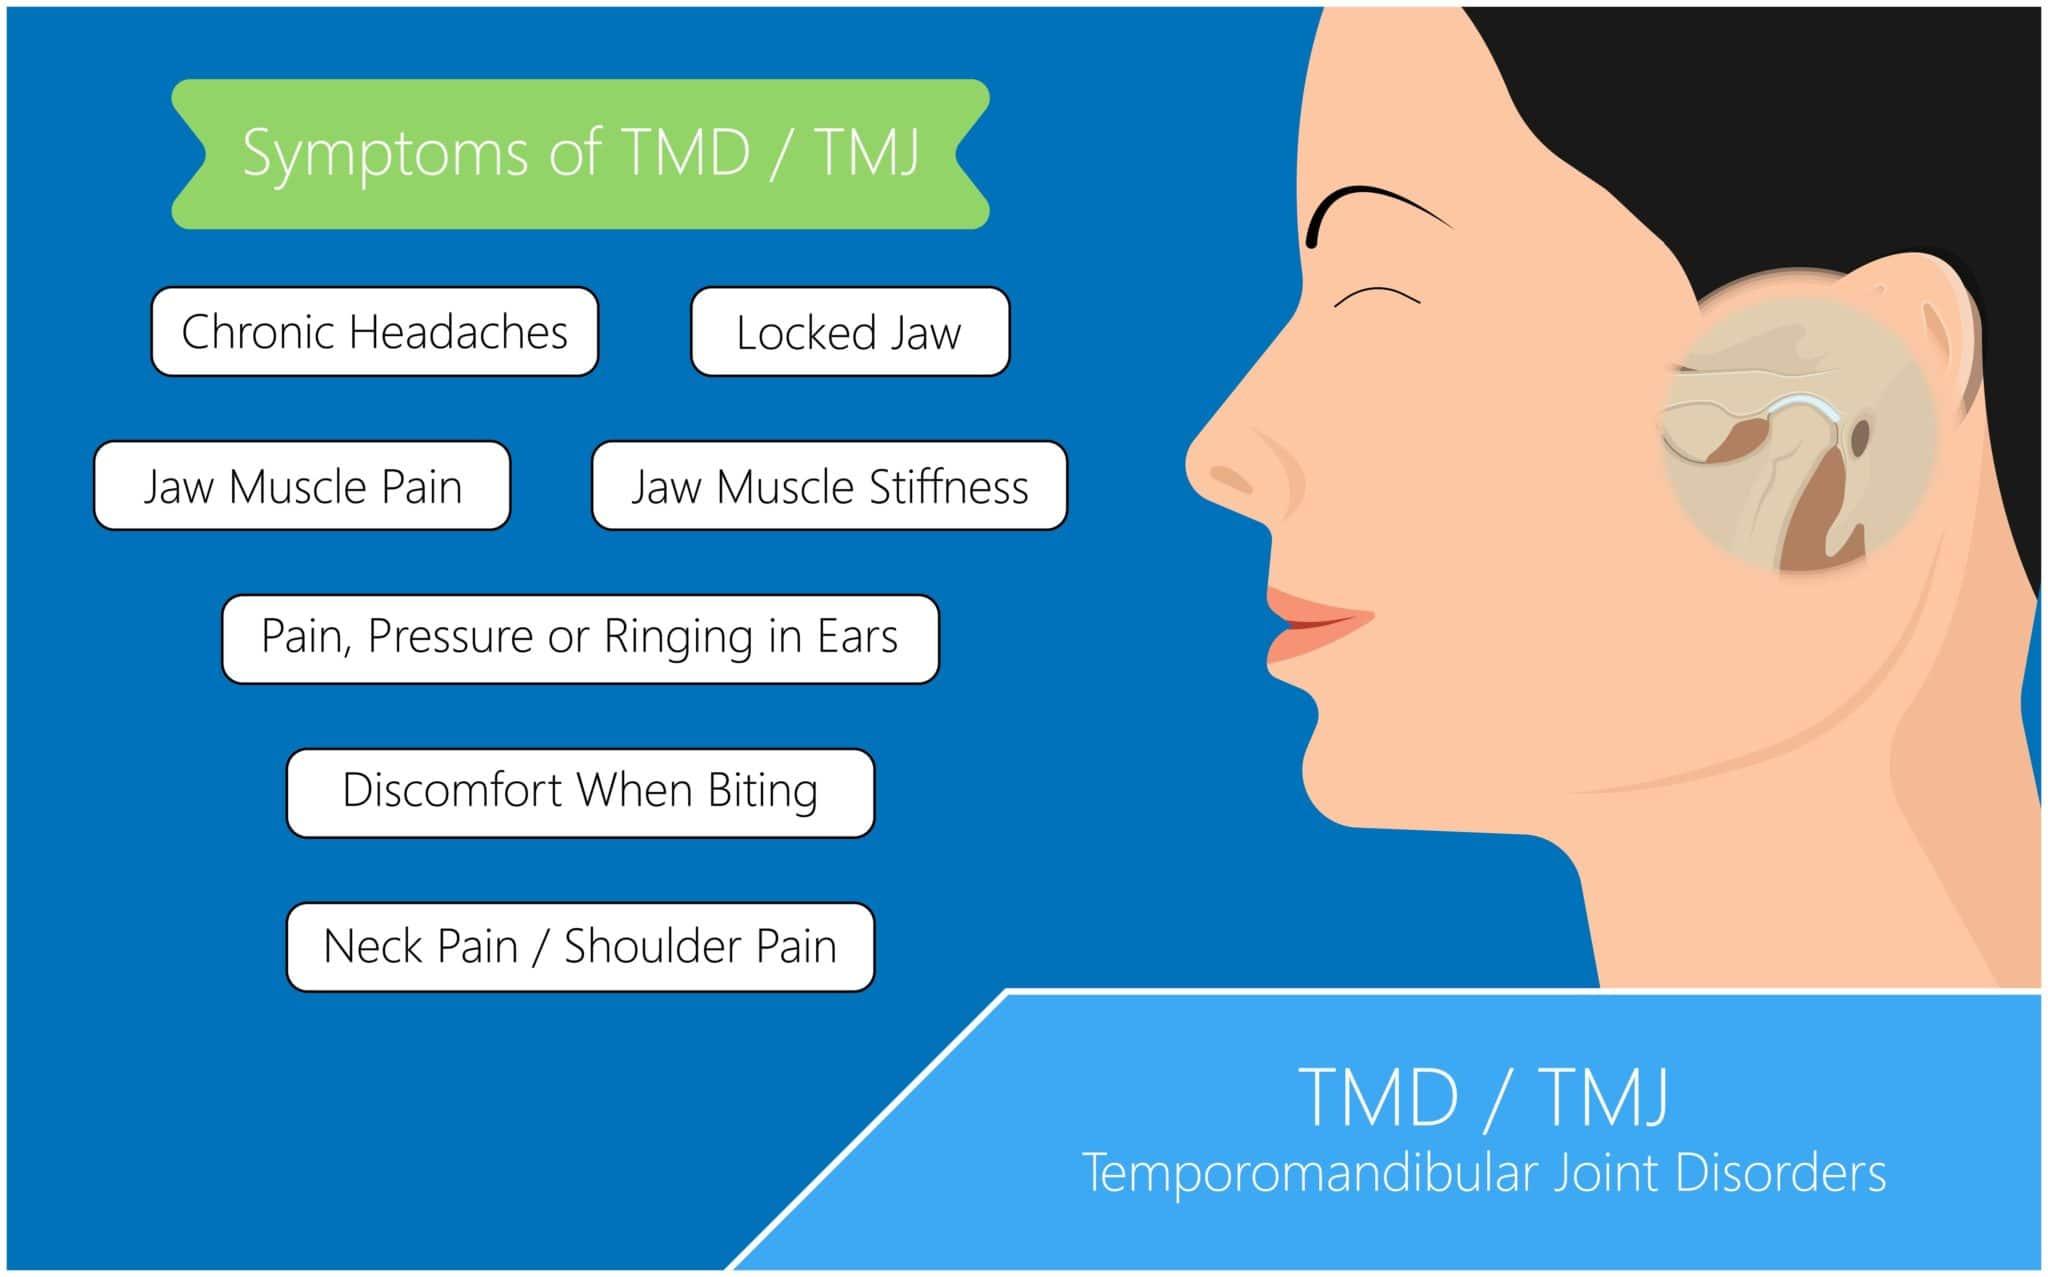 Symptoms of TMJ Disorder infographic temporomandibular joint